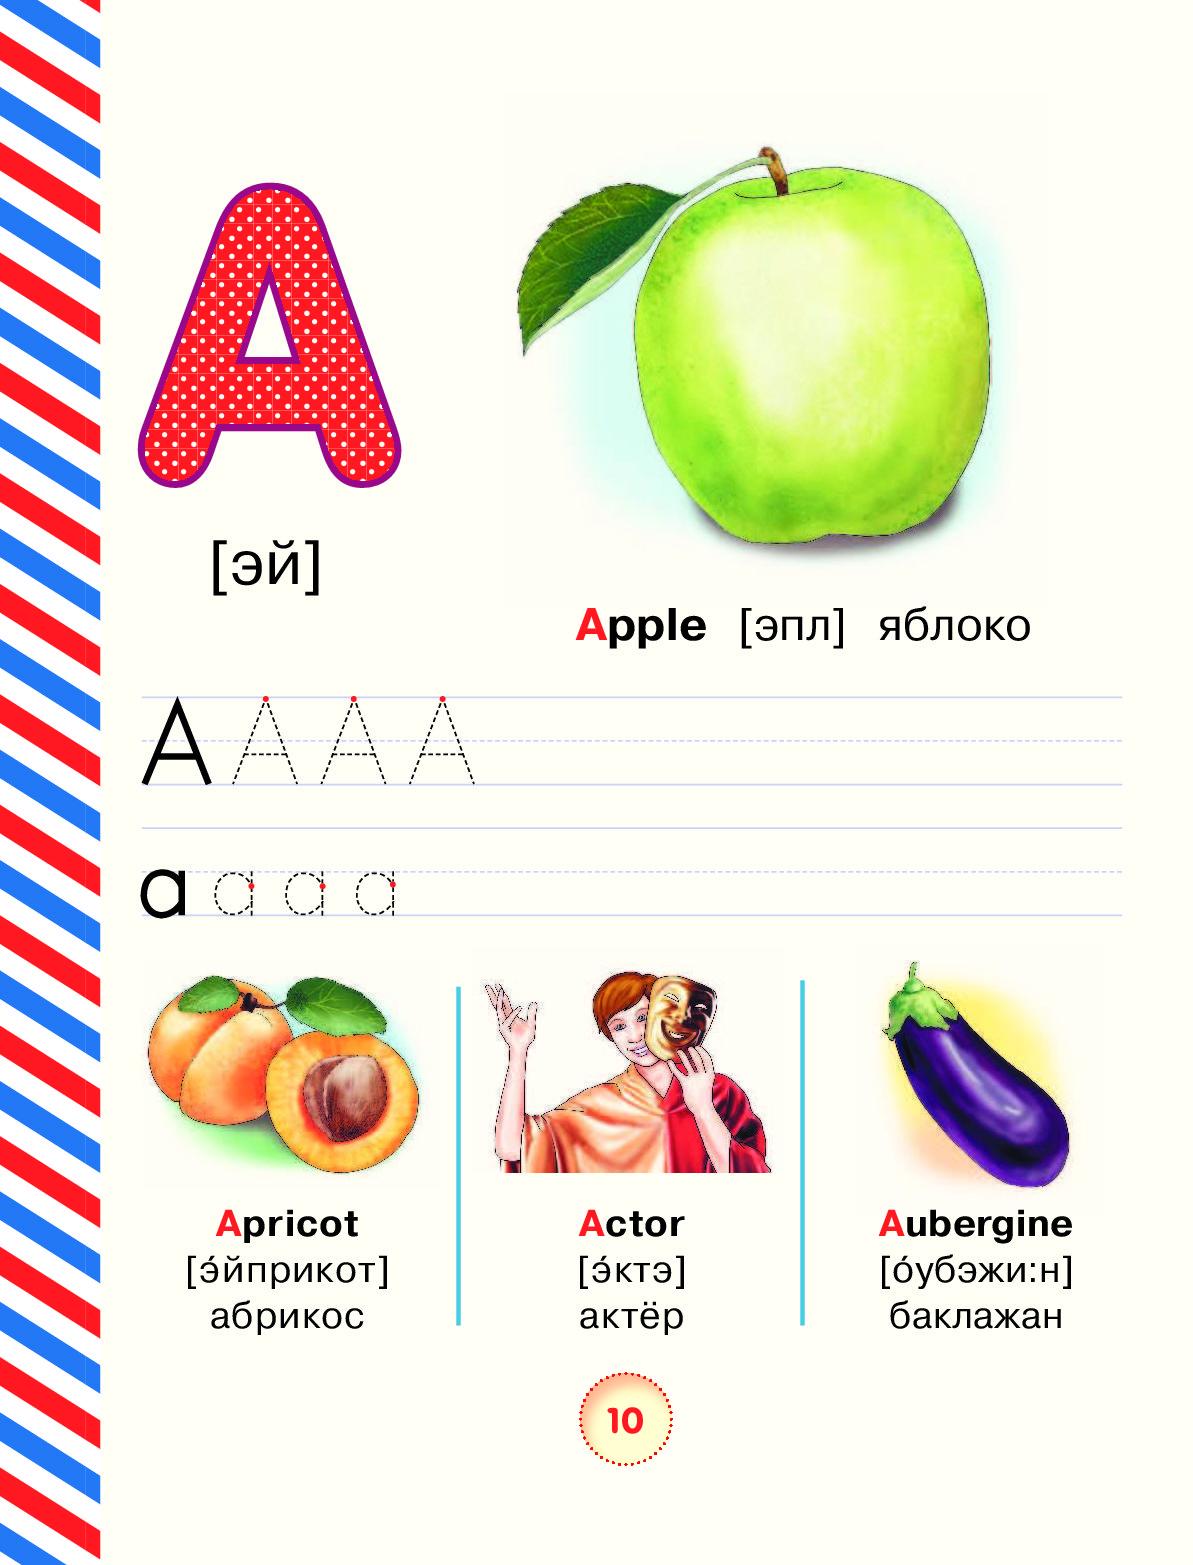 Английский букварь с картинками